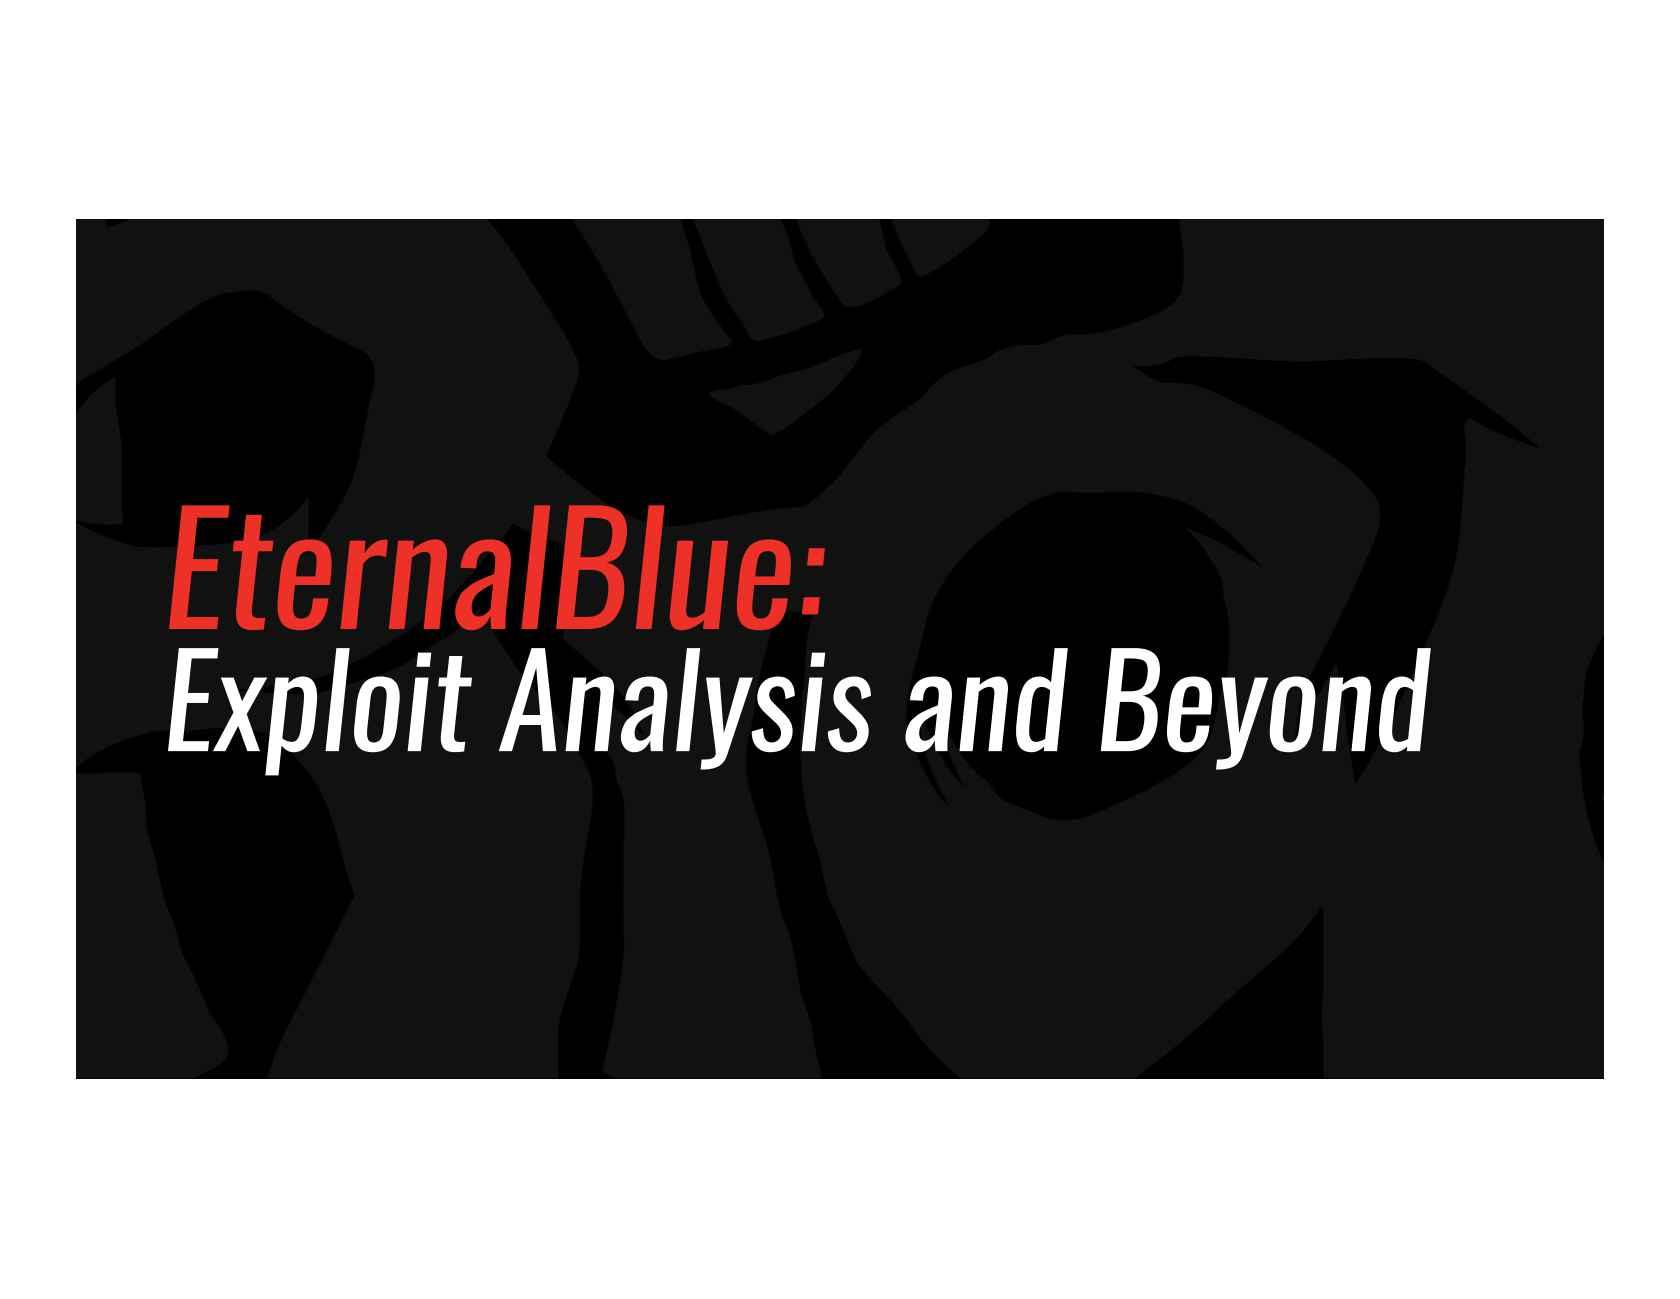 EternalBlue: Exploit Analysis and beyond